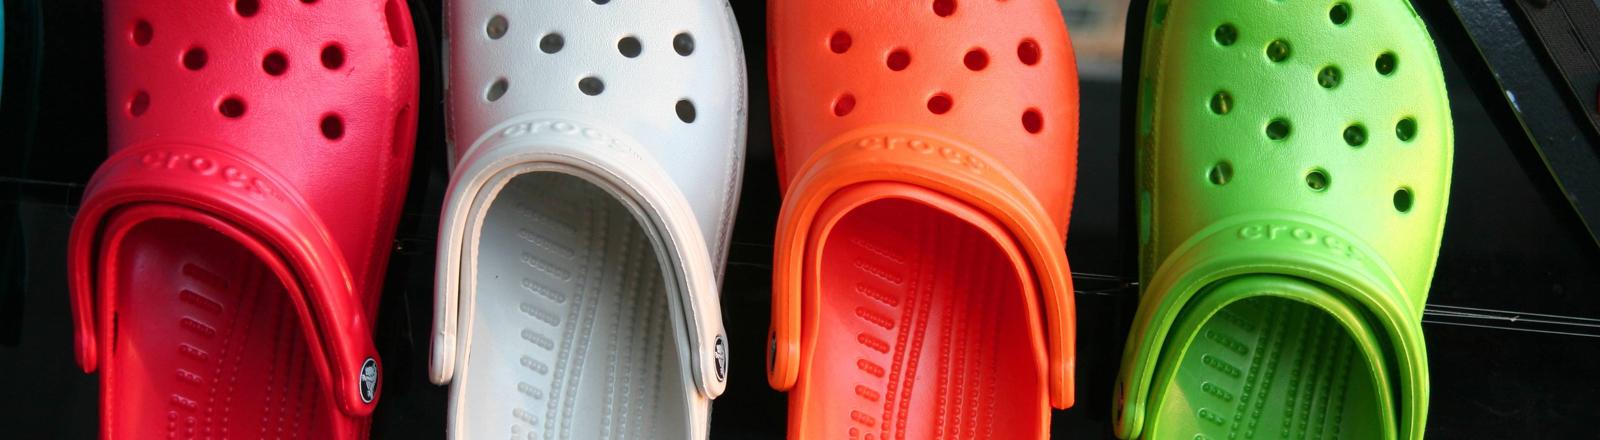 Vier bunte Crocs nebeneinander.